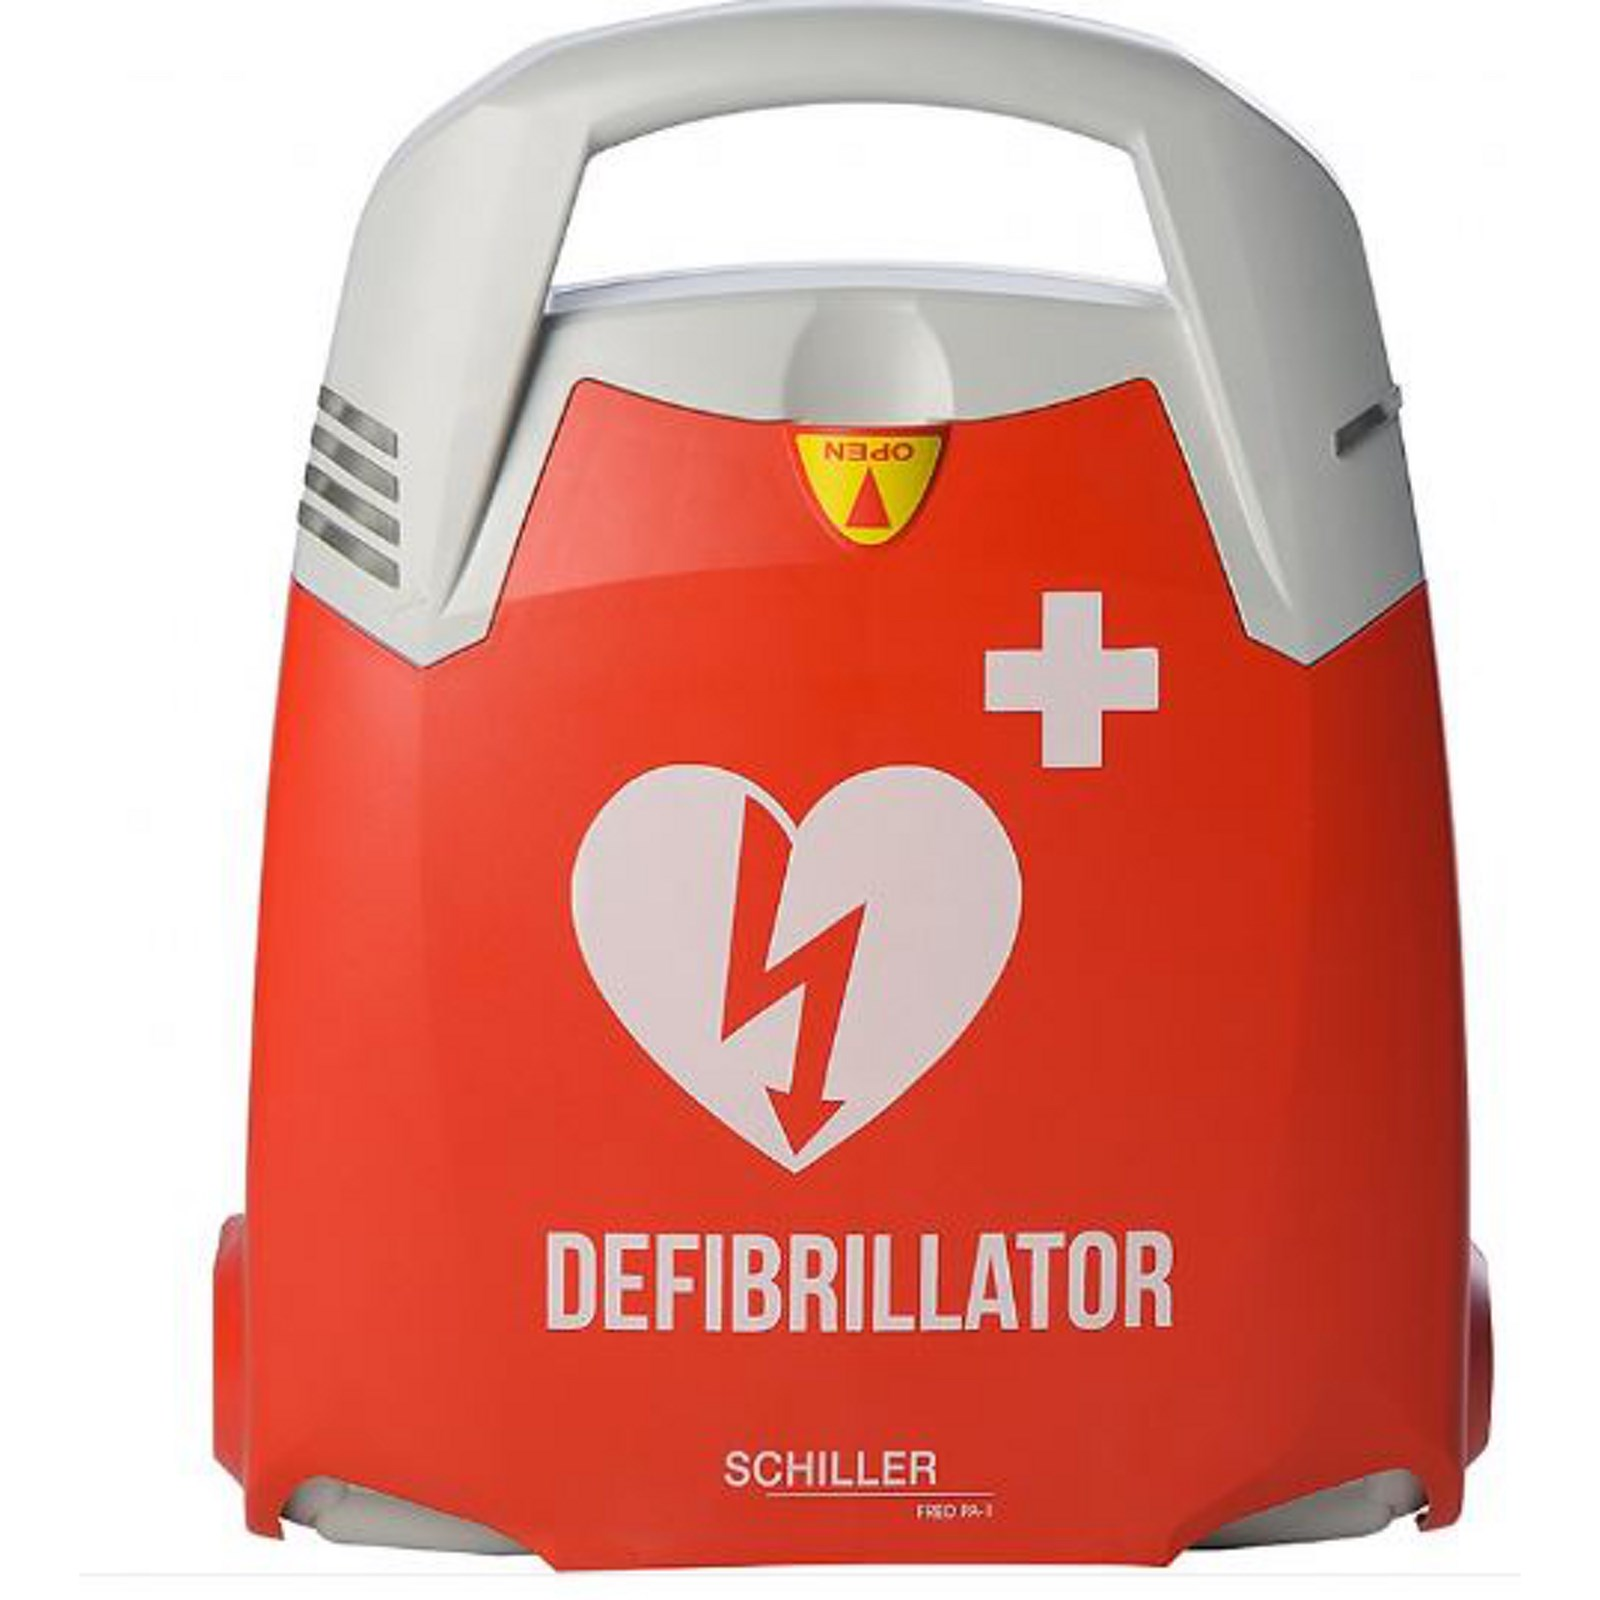 Schiller Public Access Defibrillator